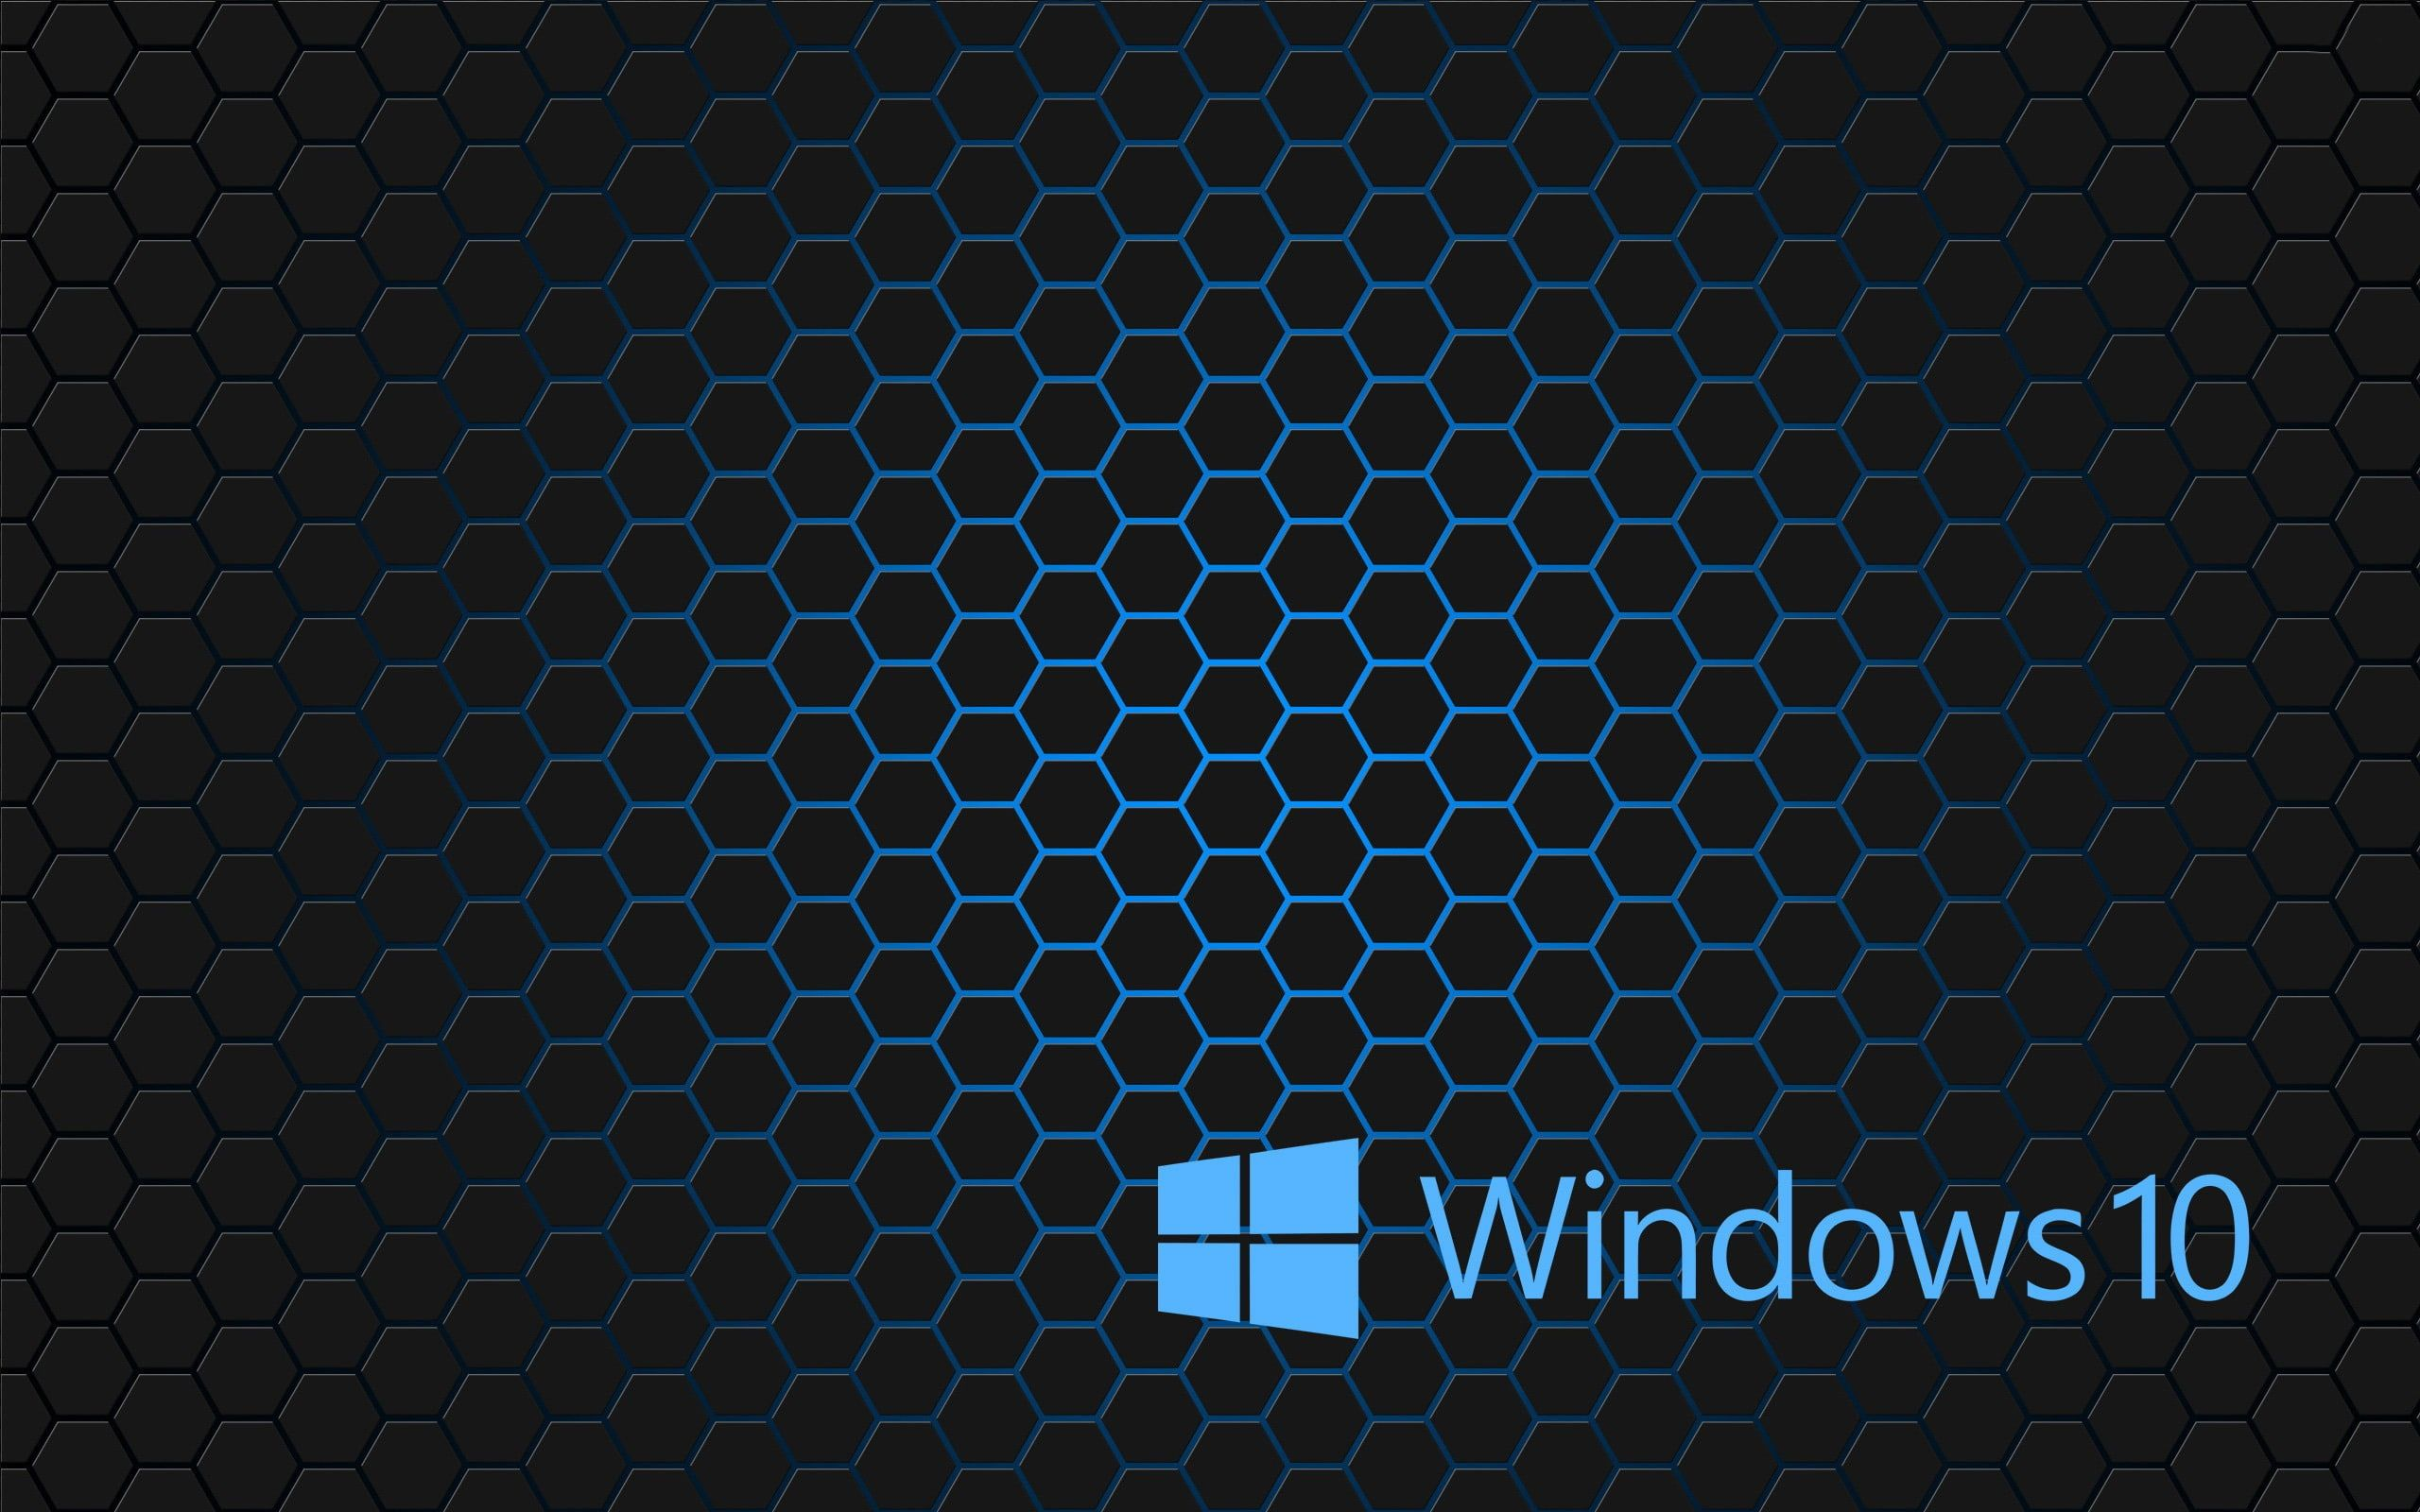 Windows 10 Hd Theme Desktop Wallpaper 14 Windows 10 Logo 2k Wallpaper Hdwallpaper Desktop Windows 10 Logo Wallpaper Windows 10 Windows